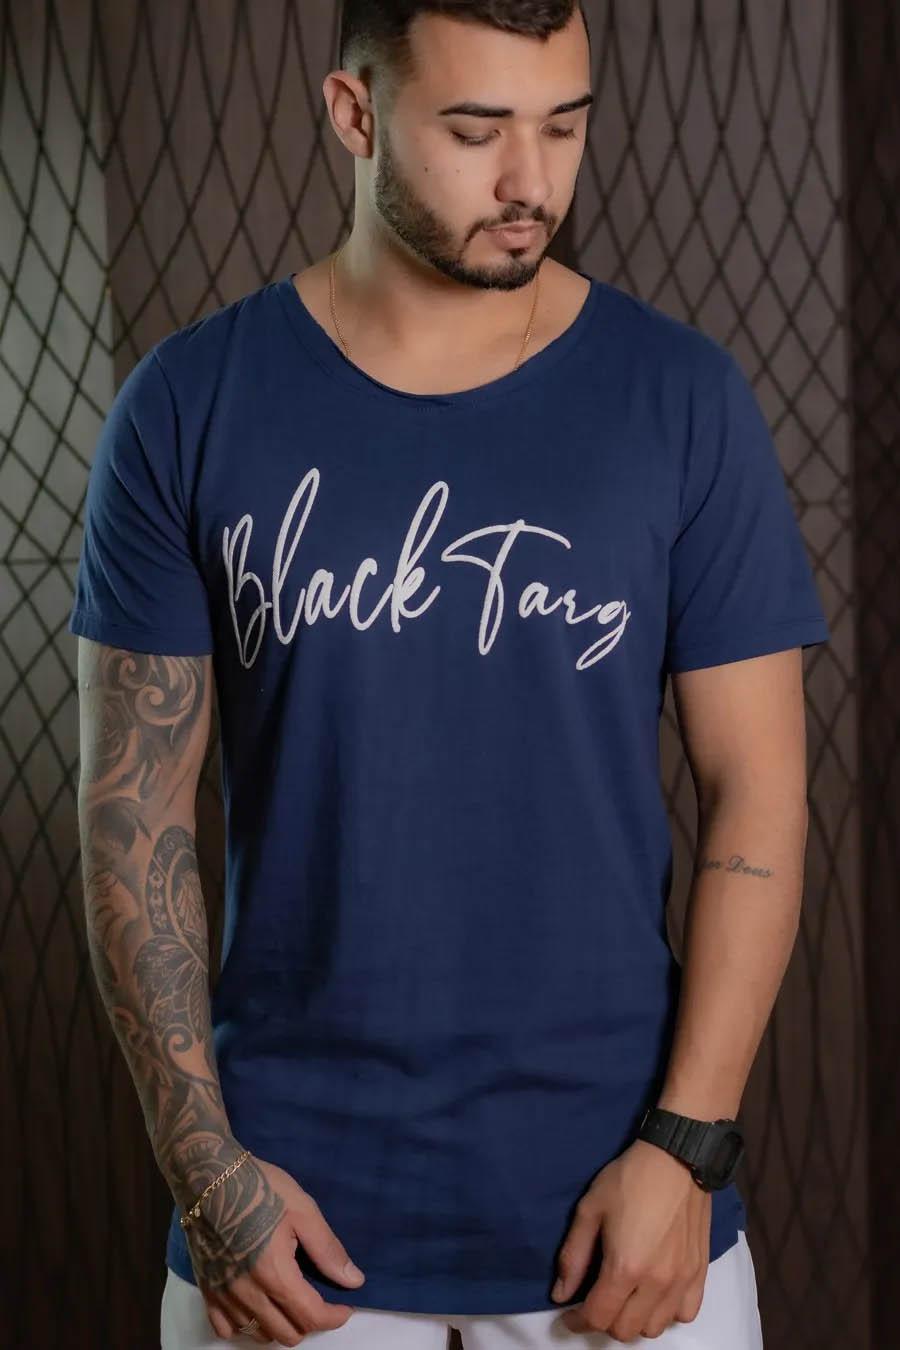 Kit Black - 3 Camisetas Longline Black Targ Collection